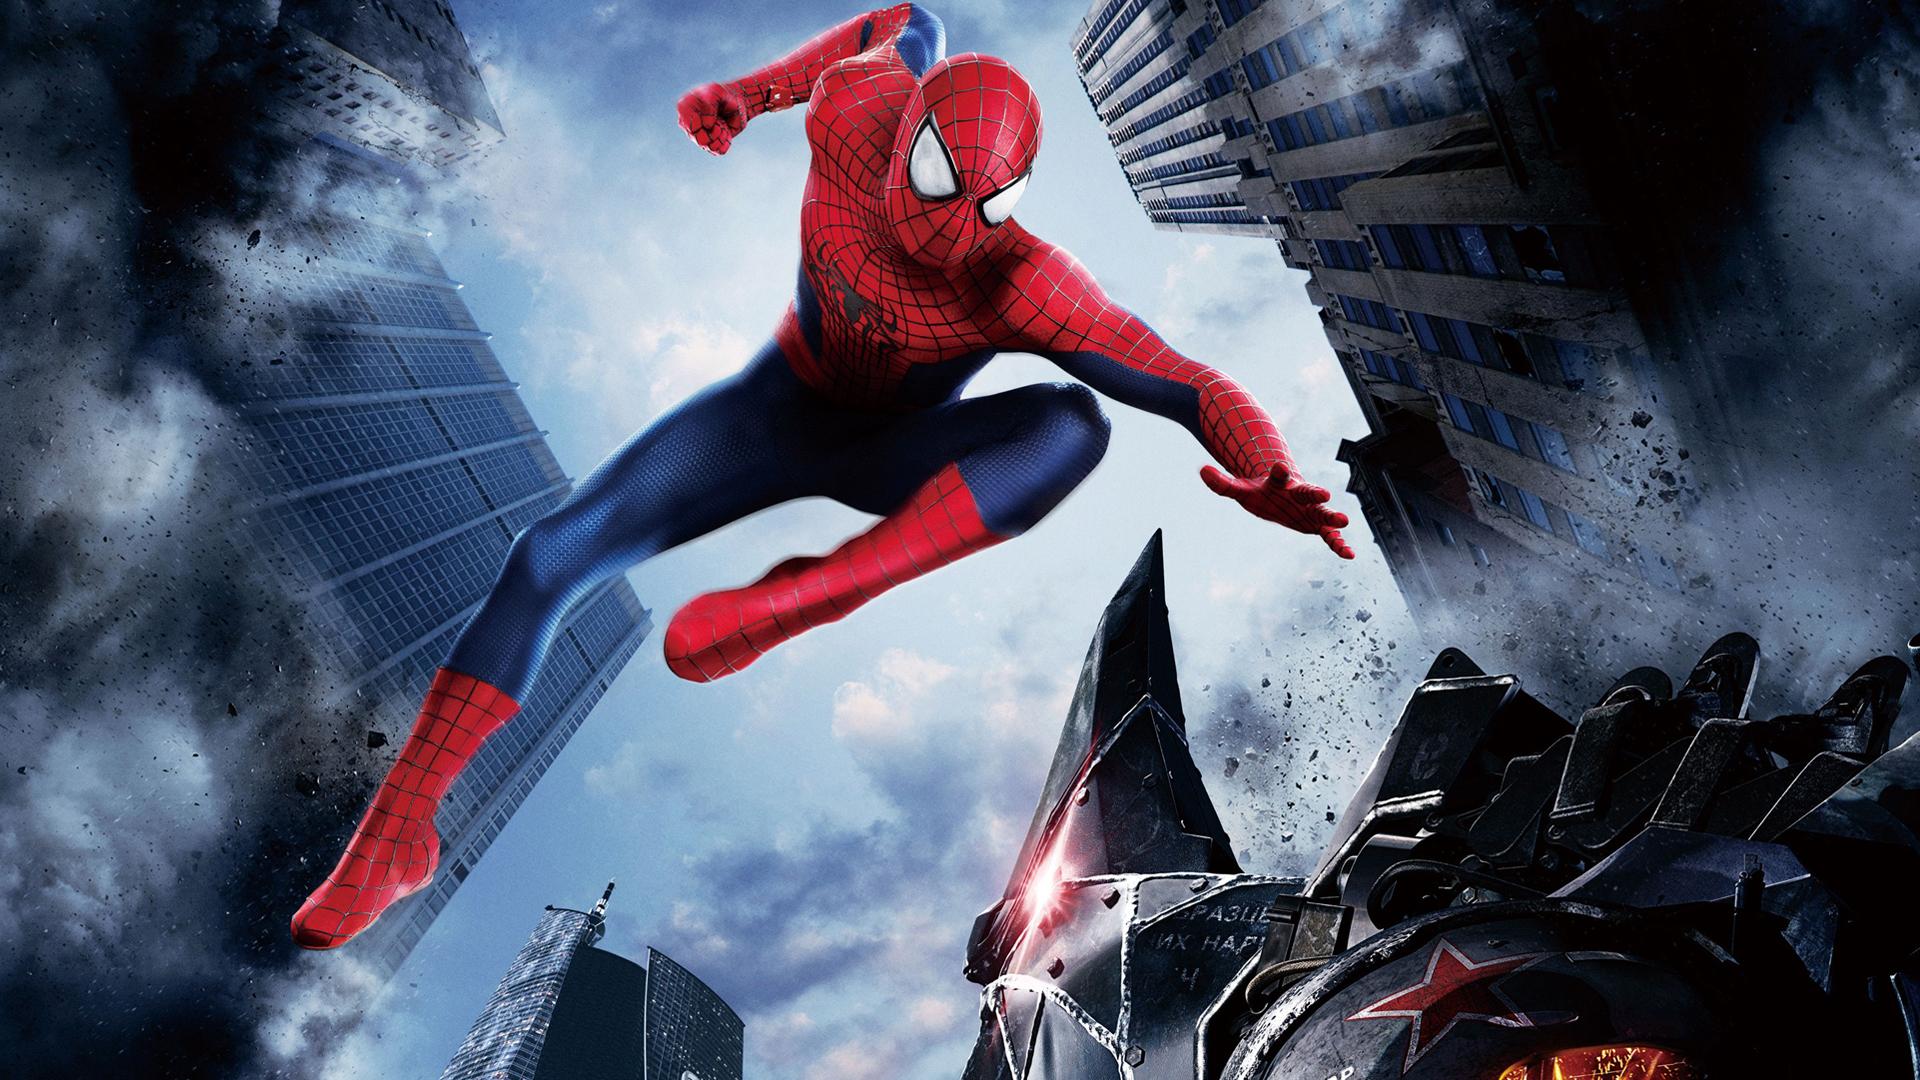 the amazing spider man vs rhino 2014 fighting movie hd 1920x1080